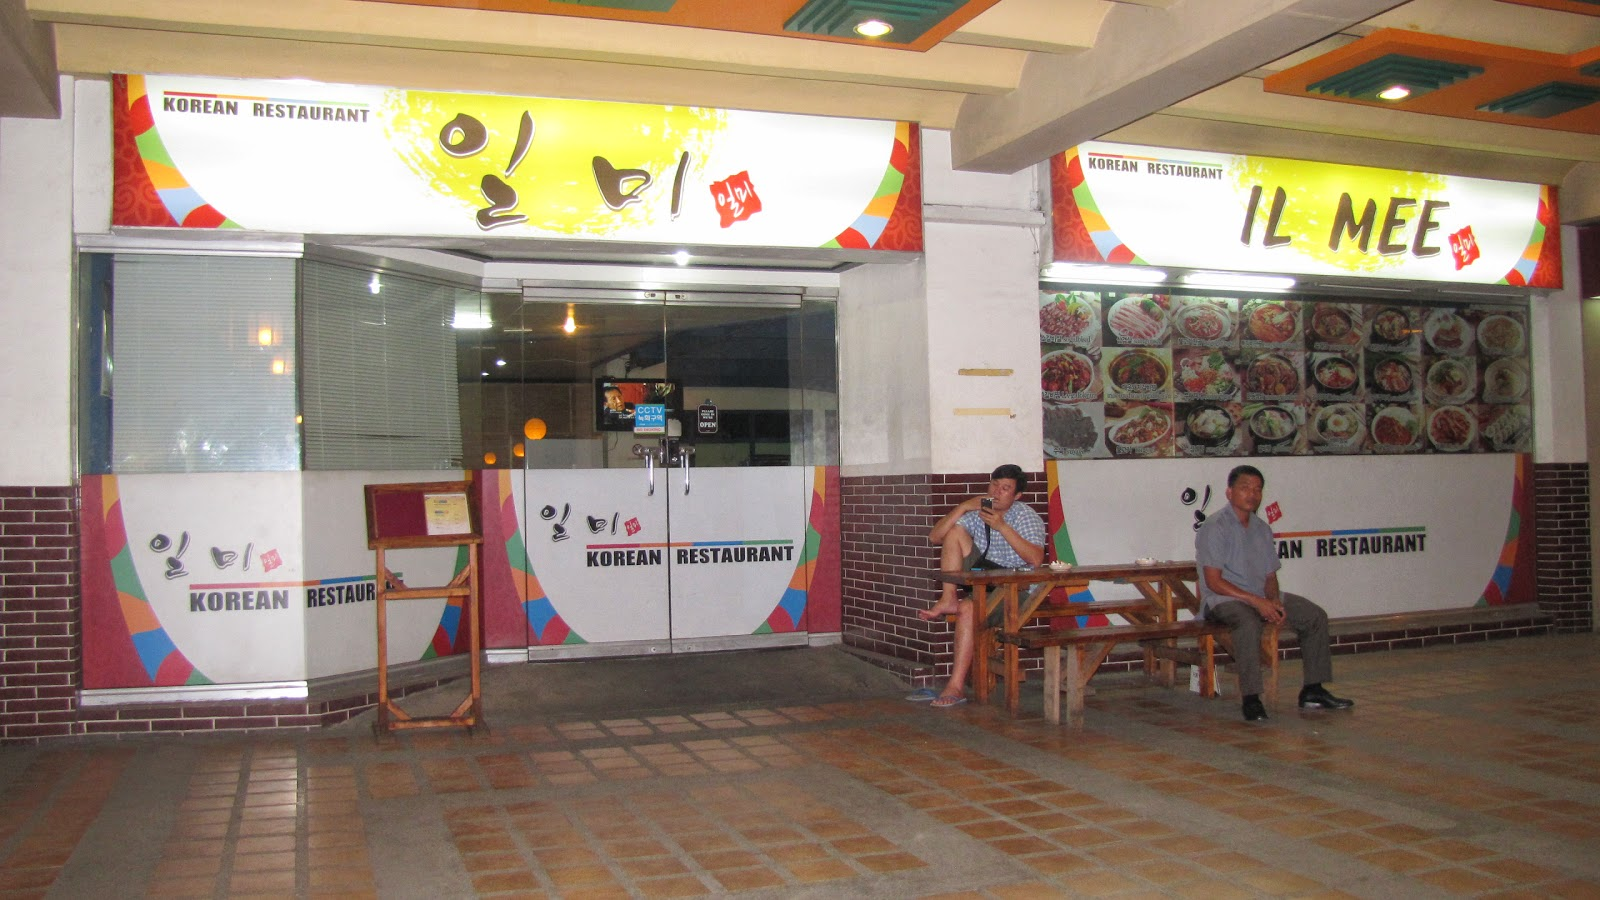 Il Mee Korean Restaurant Cebu